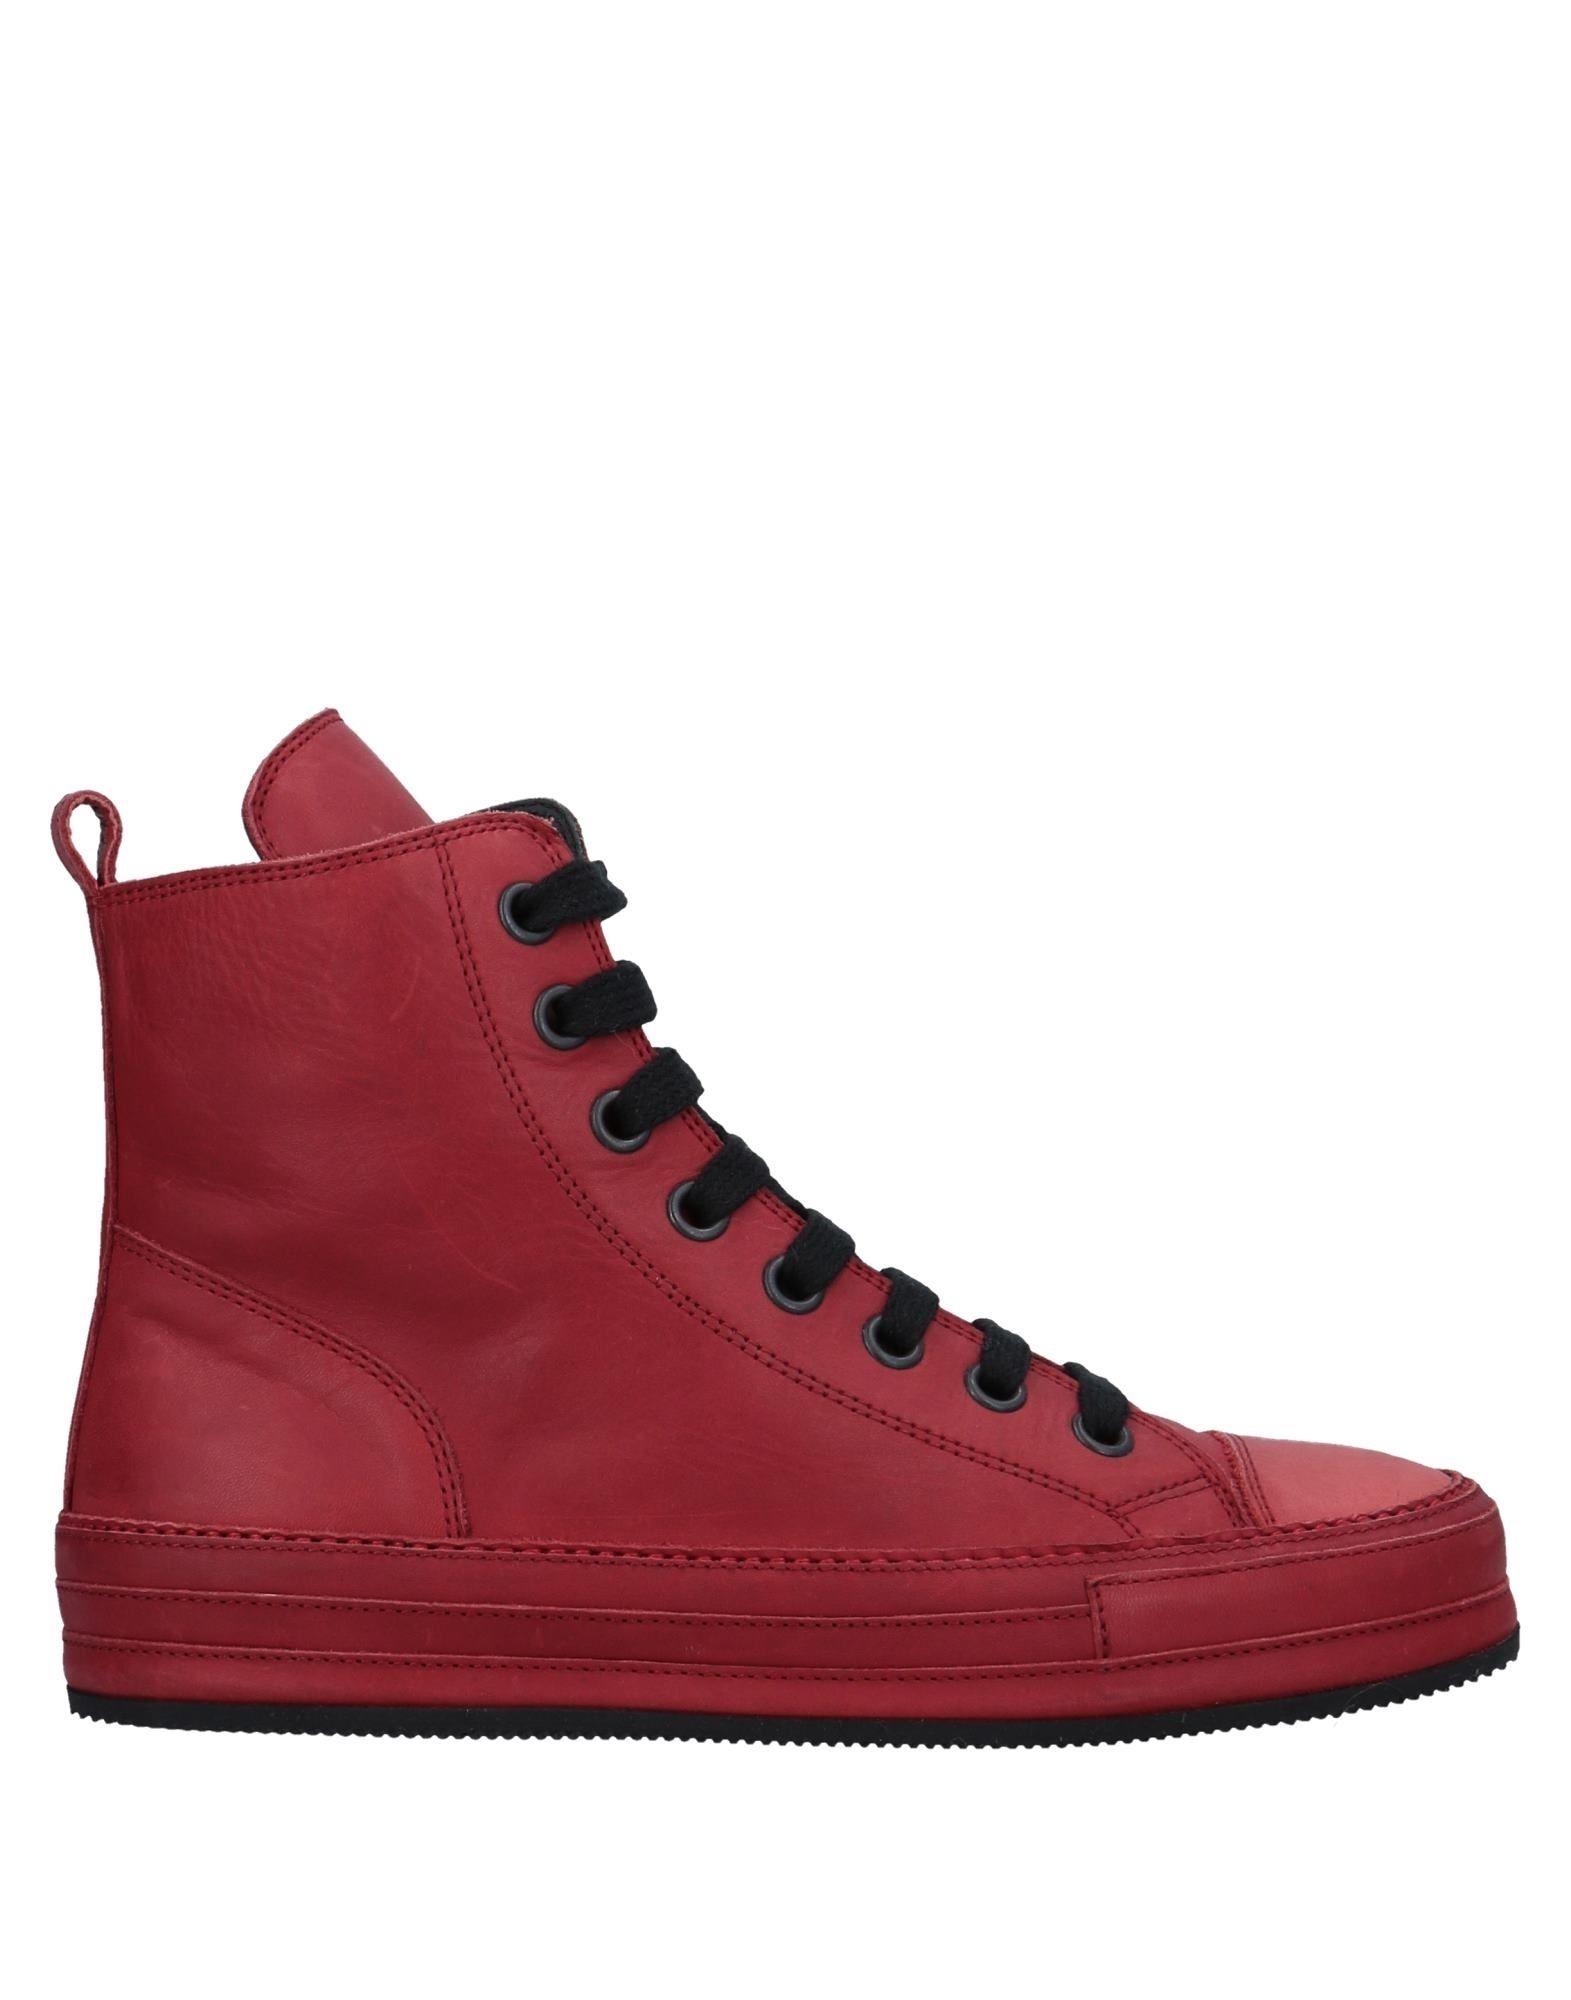 Ann Demeulemeester Sneakers - Women Ann Demeulemeester Canada Sneakers online on  Canada Demeulemeester - 11547938DV 1000b8